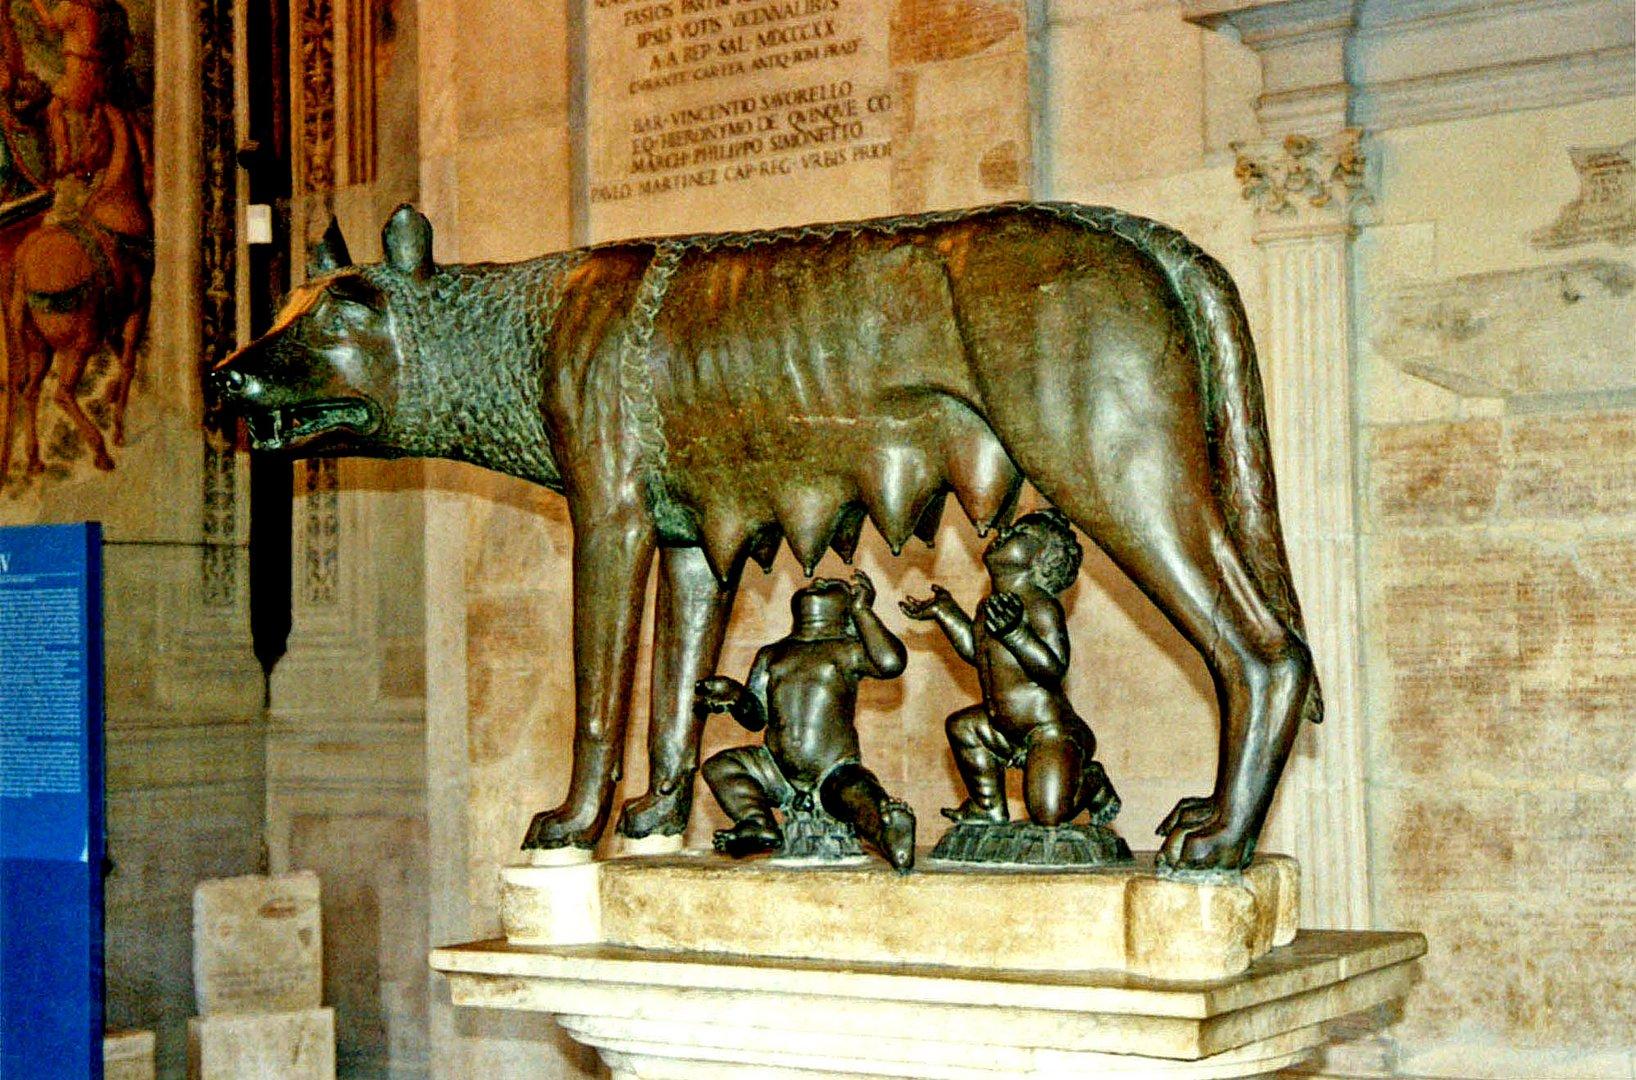 Lupa capilotina ['Mater Romanorum'] in Capitoline Museums, Rome